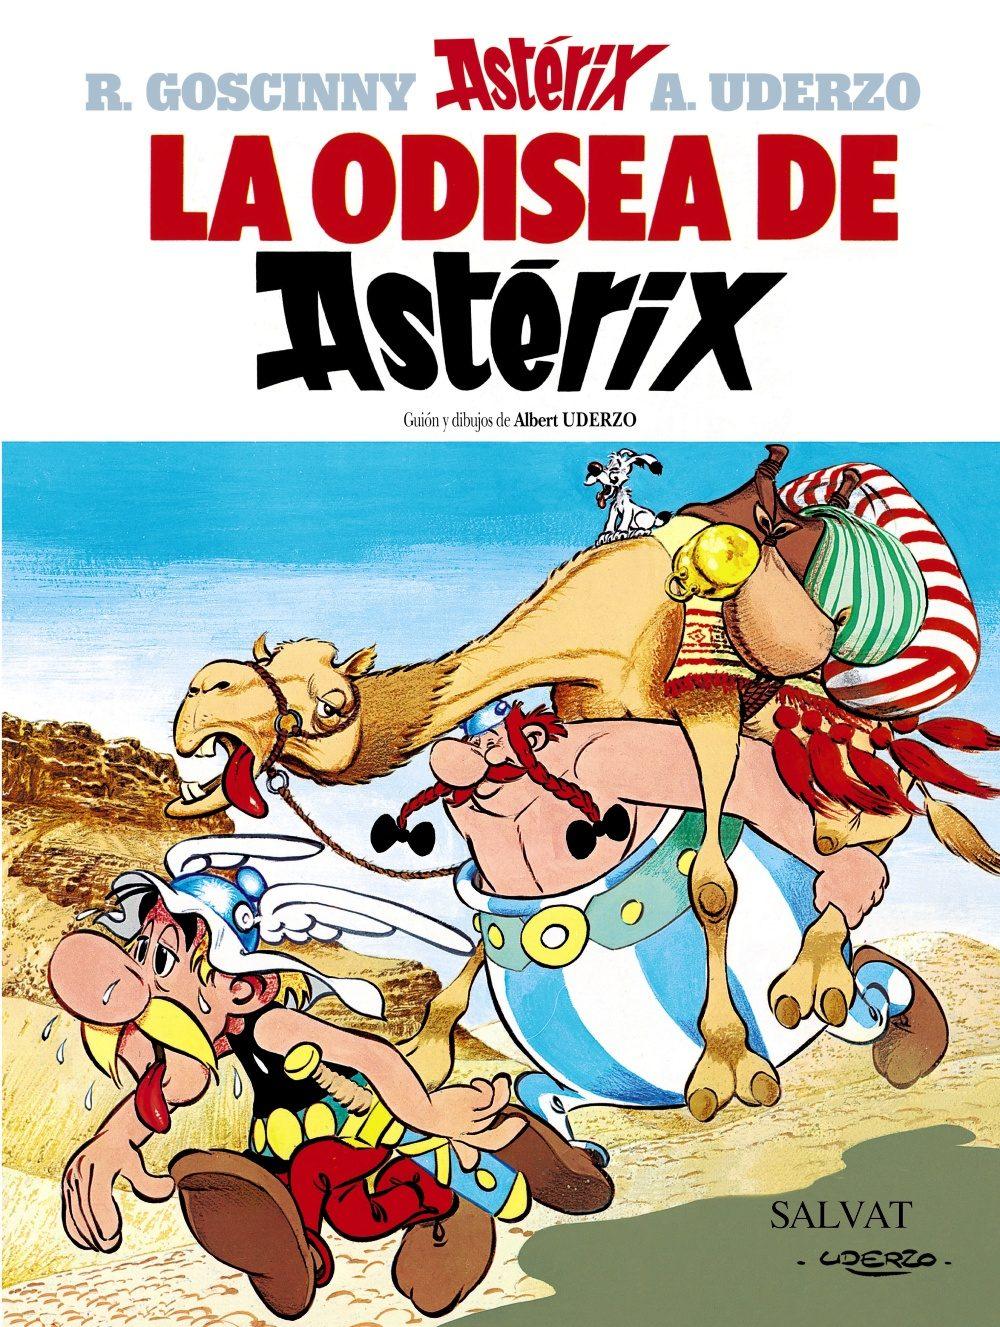 La Odisea de Astérix,René Goscinny, Albert Uderzo,Salvat  tienda de comics en México distrito federal, venta de comics en México df